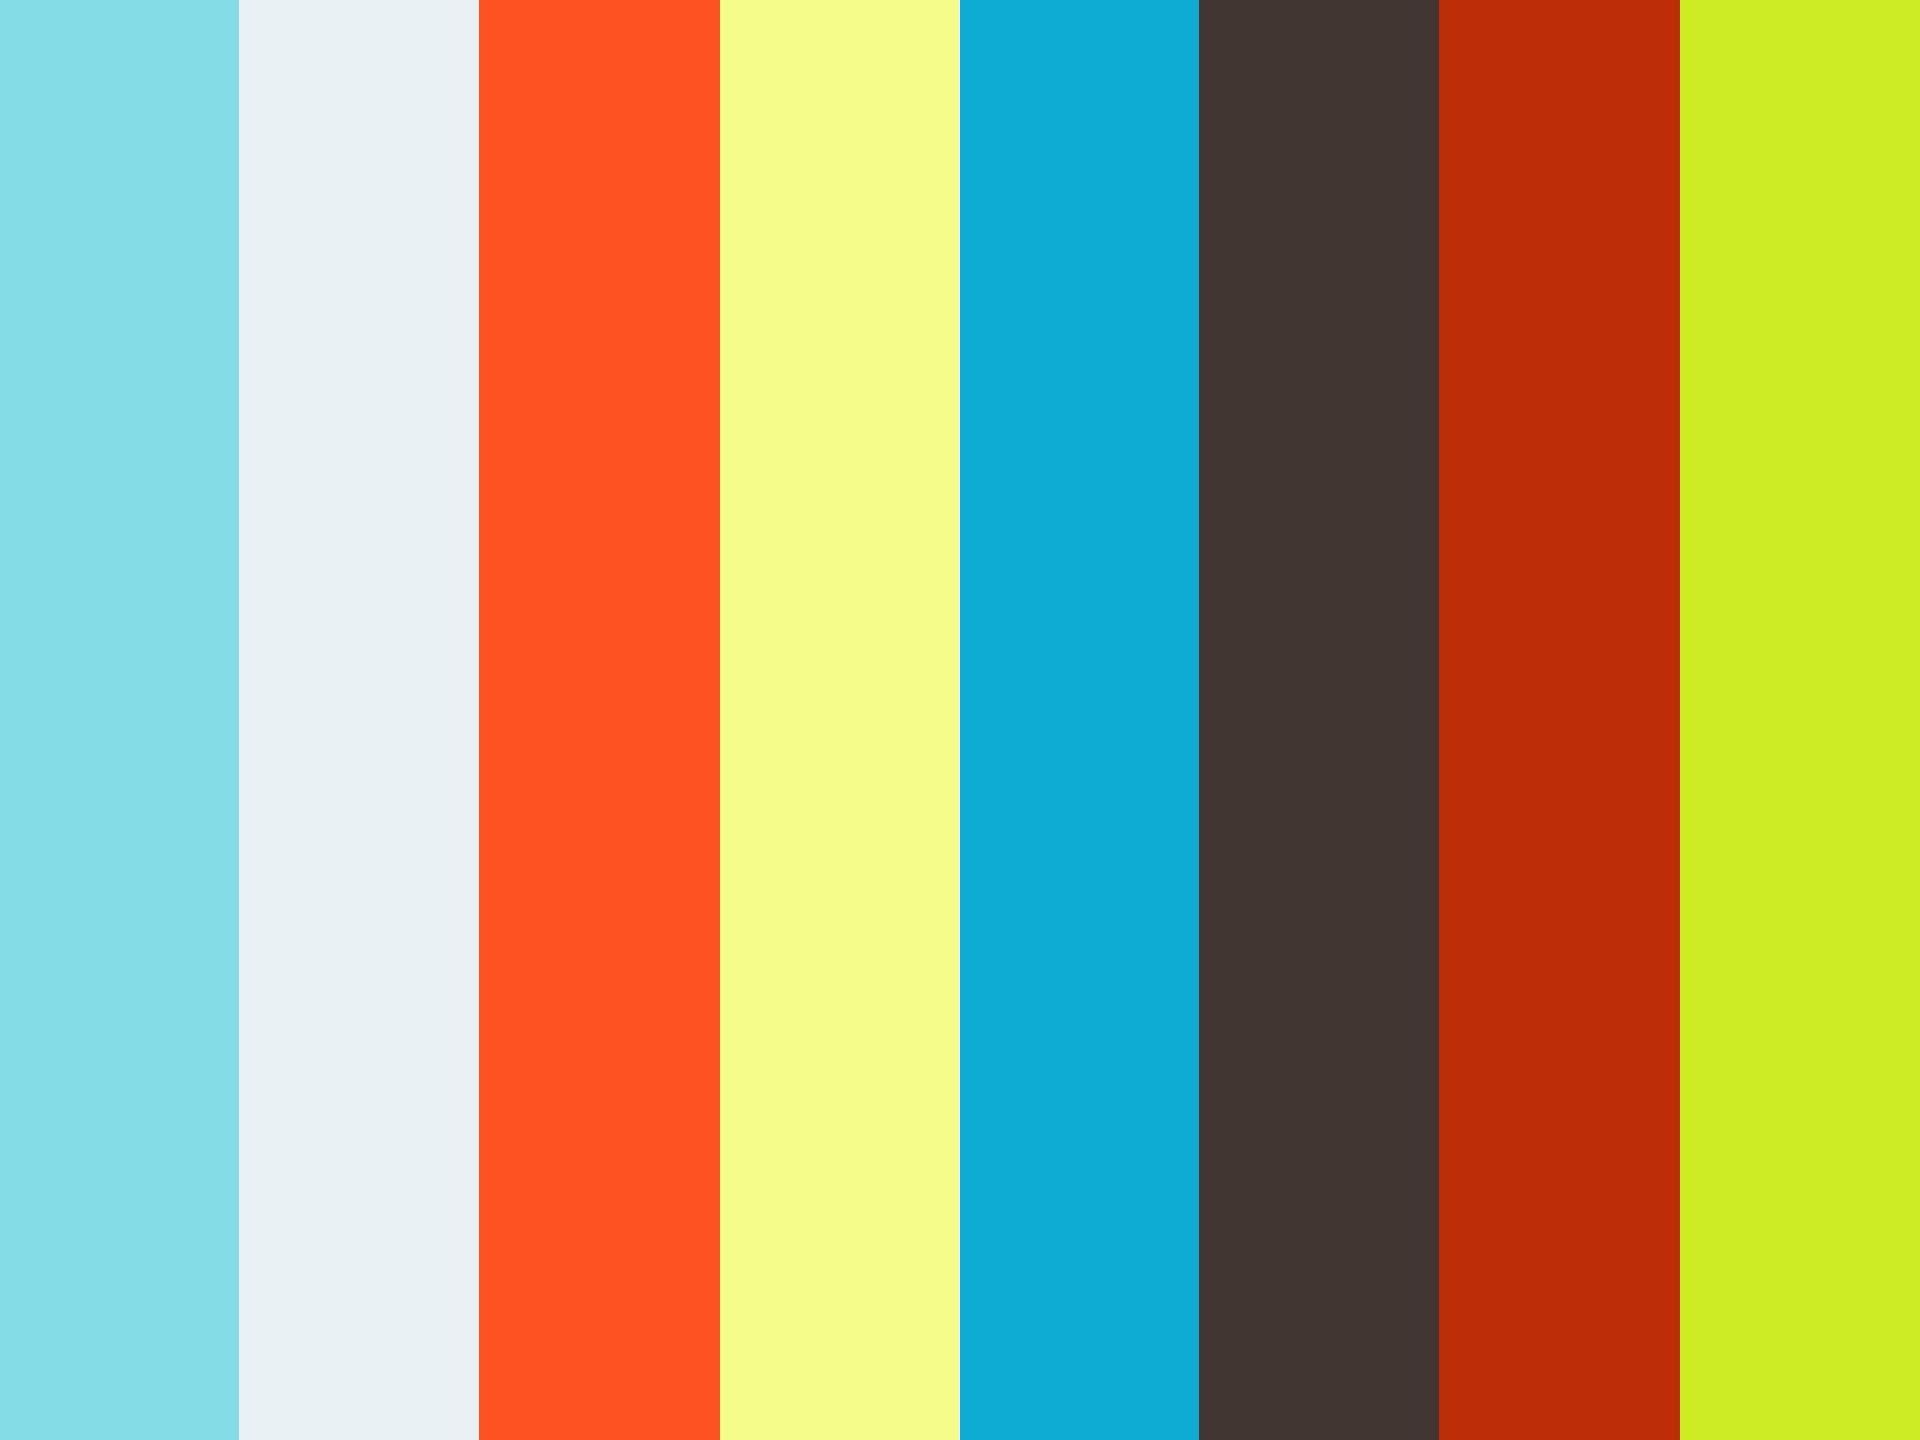 clyde house glasgow on vimeo